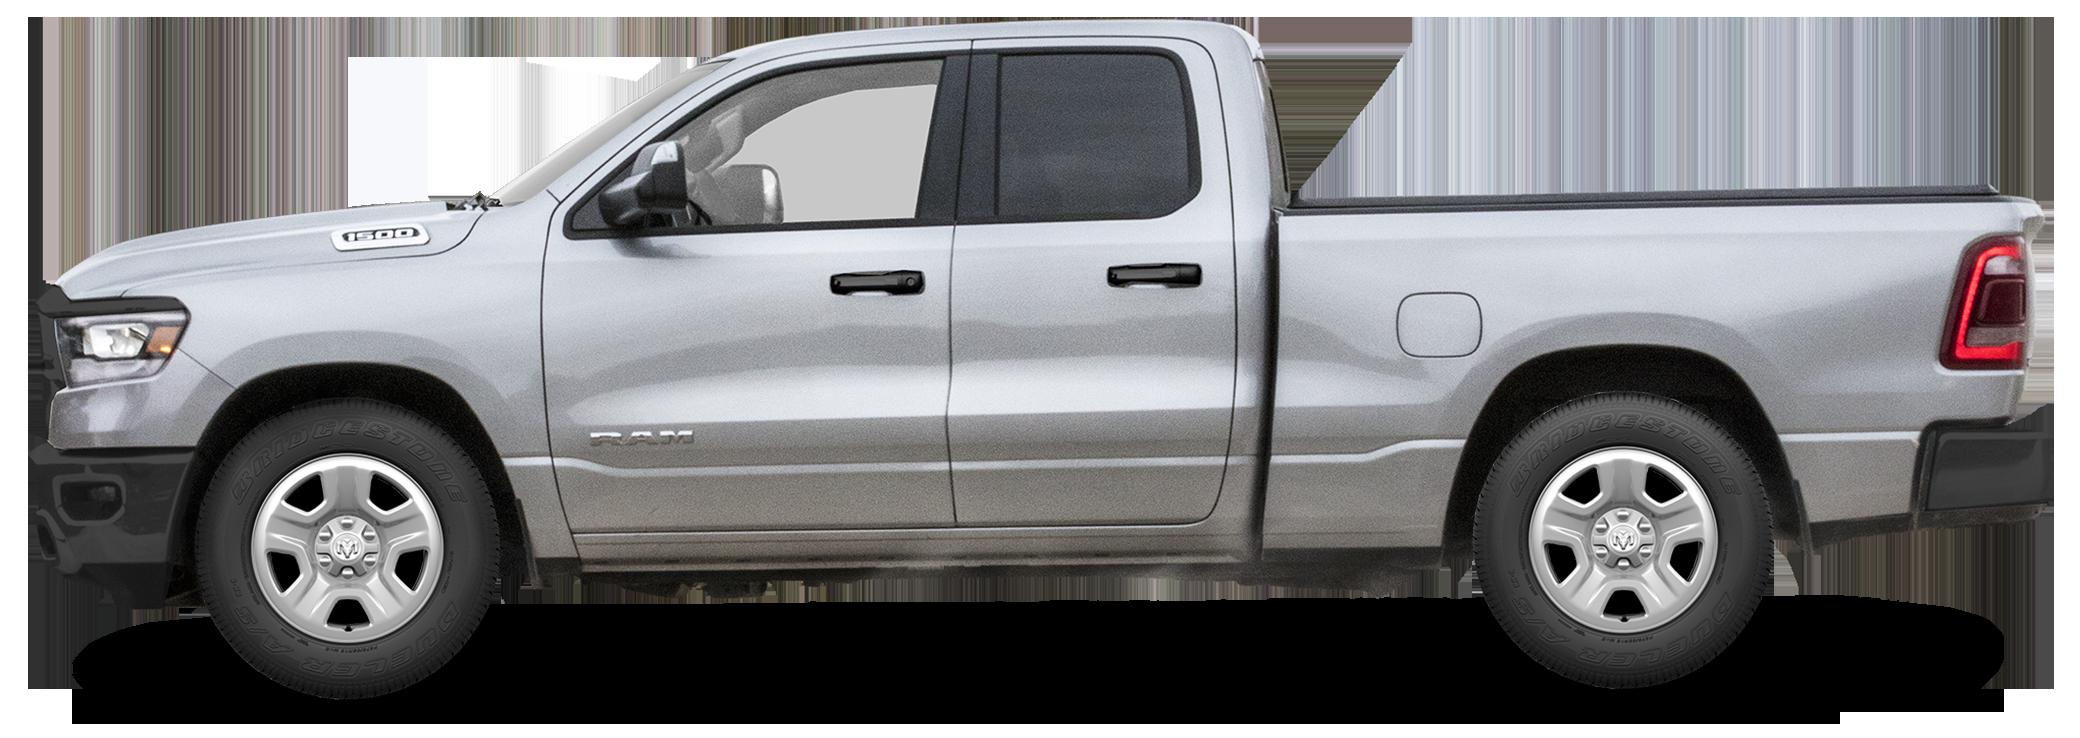 2021 Ram 1500 Truck Tradesman